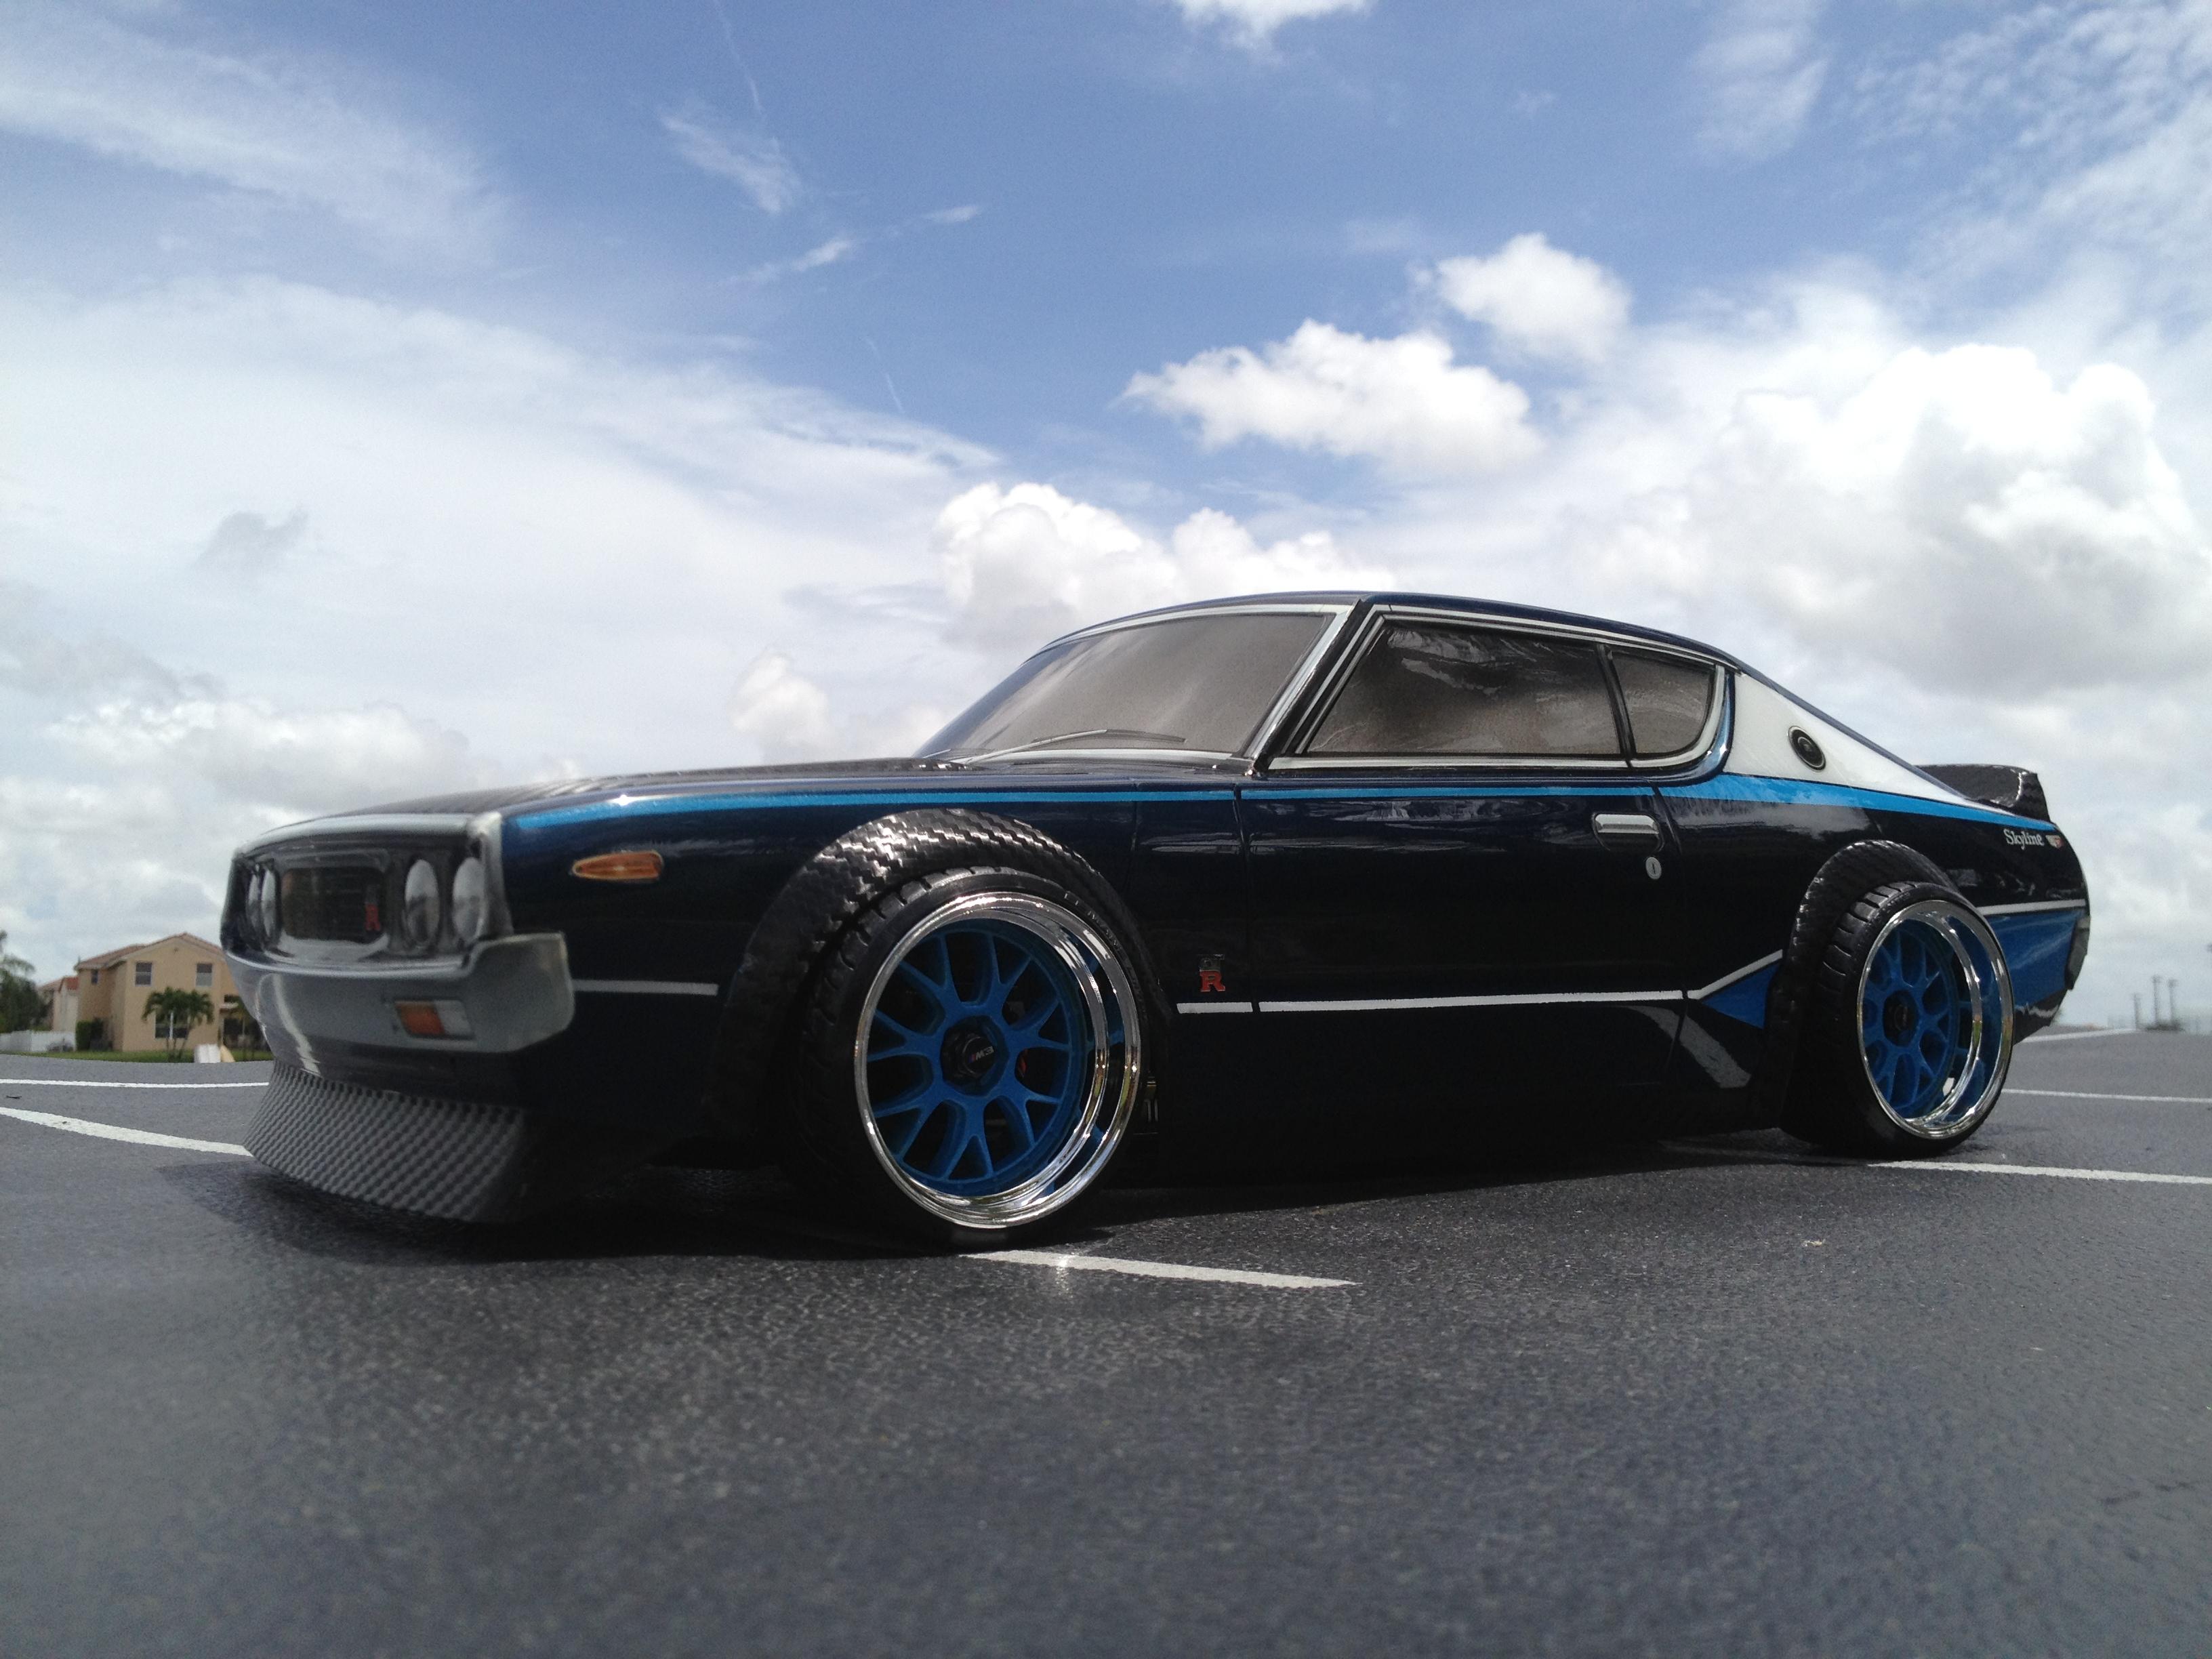 Nissan Gtr Turbo